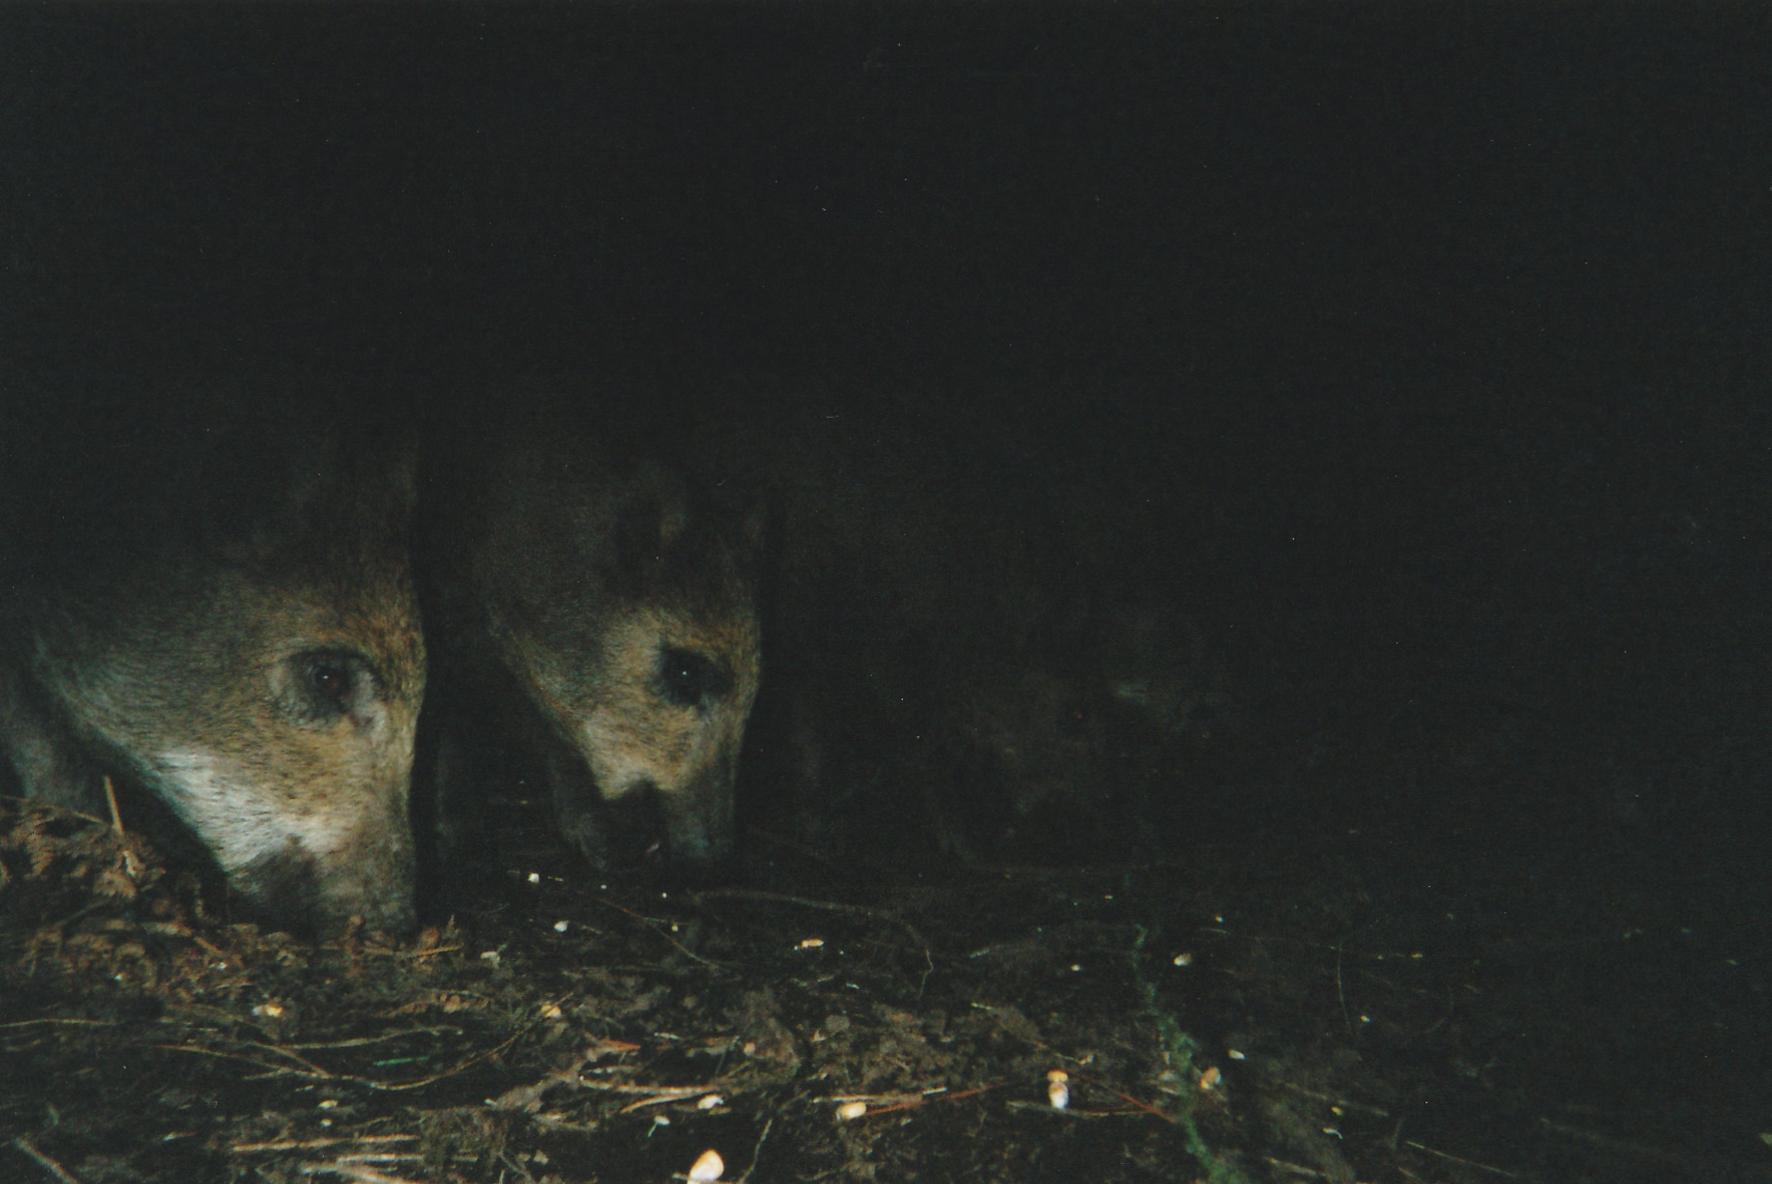 Wild Boar Photos 36.jpg